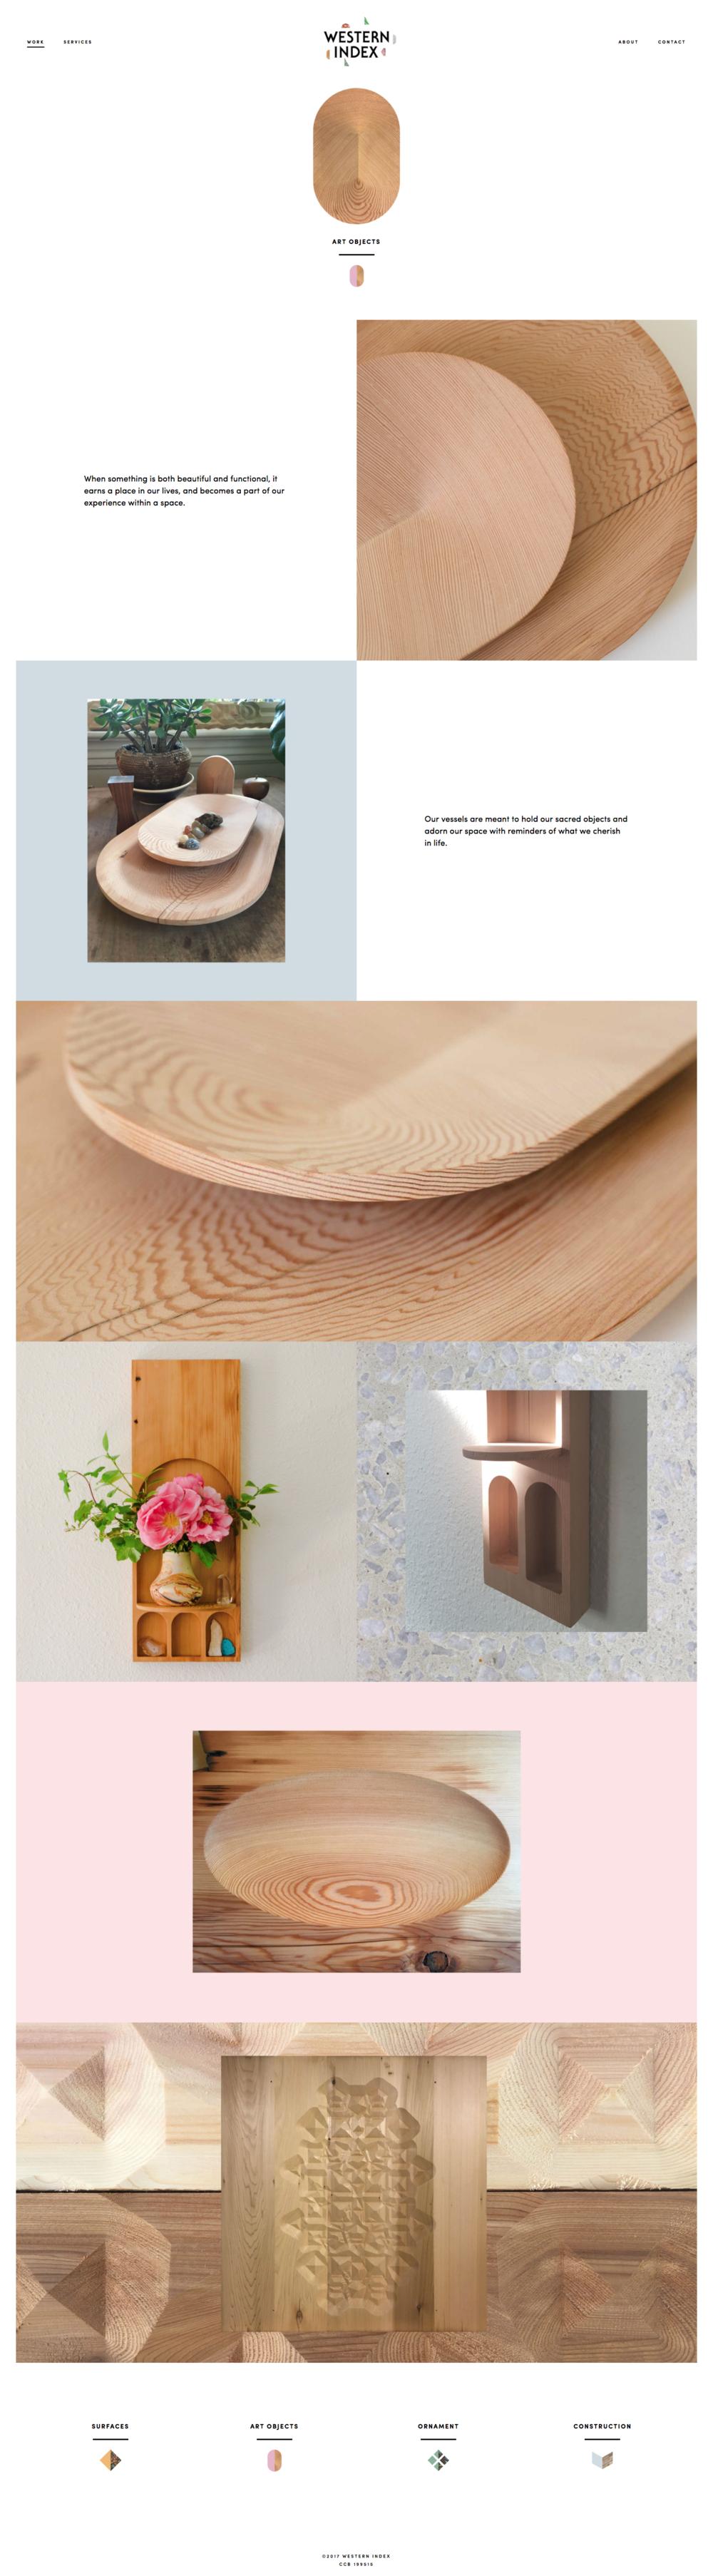 screencapture-westernindex-art-objects-1510177244739.png